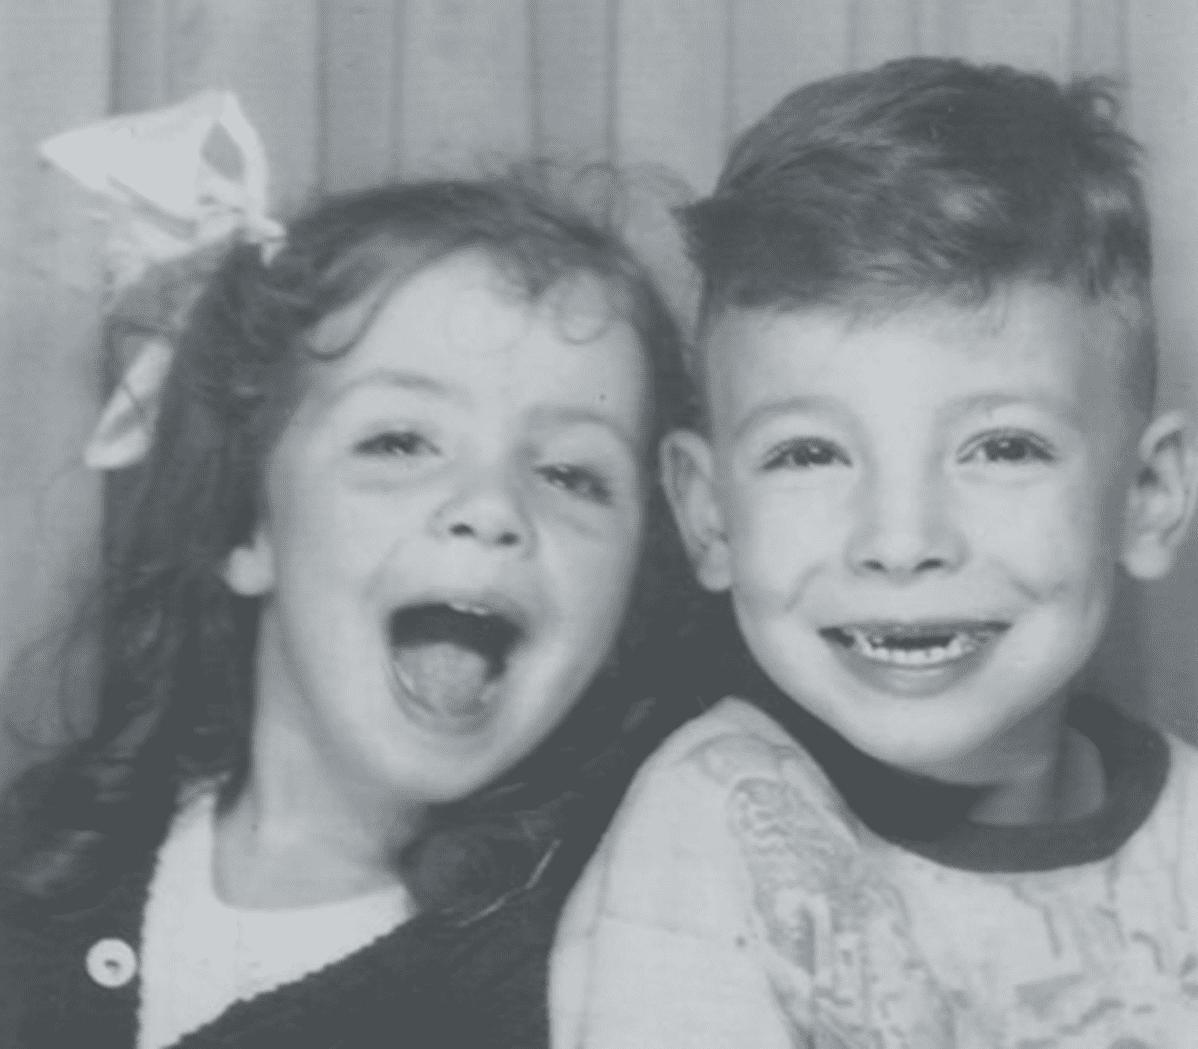 Bruce Springsteen siskonsa kanssa lapsena.